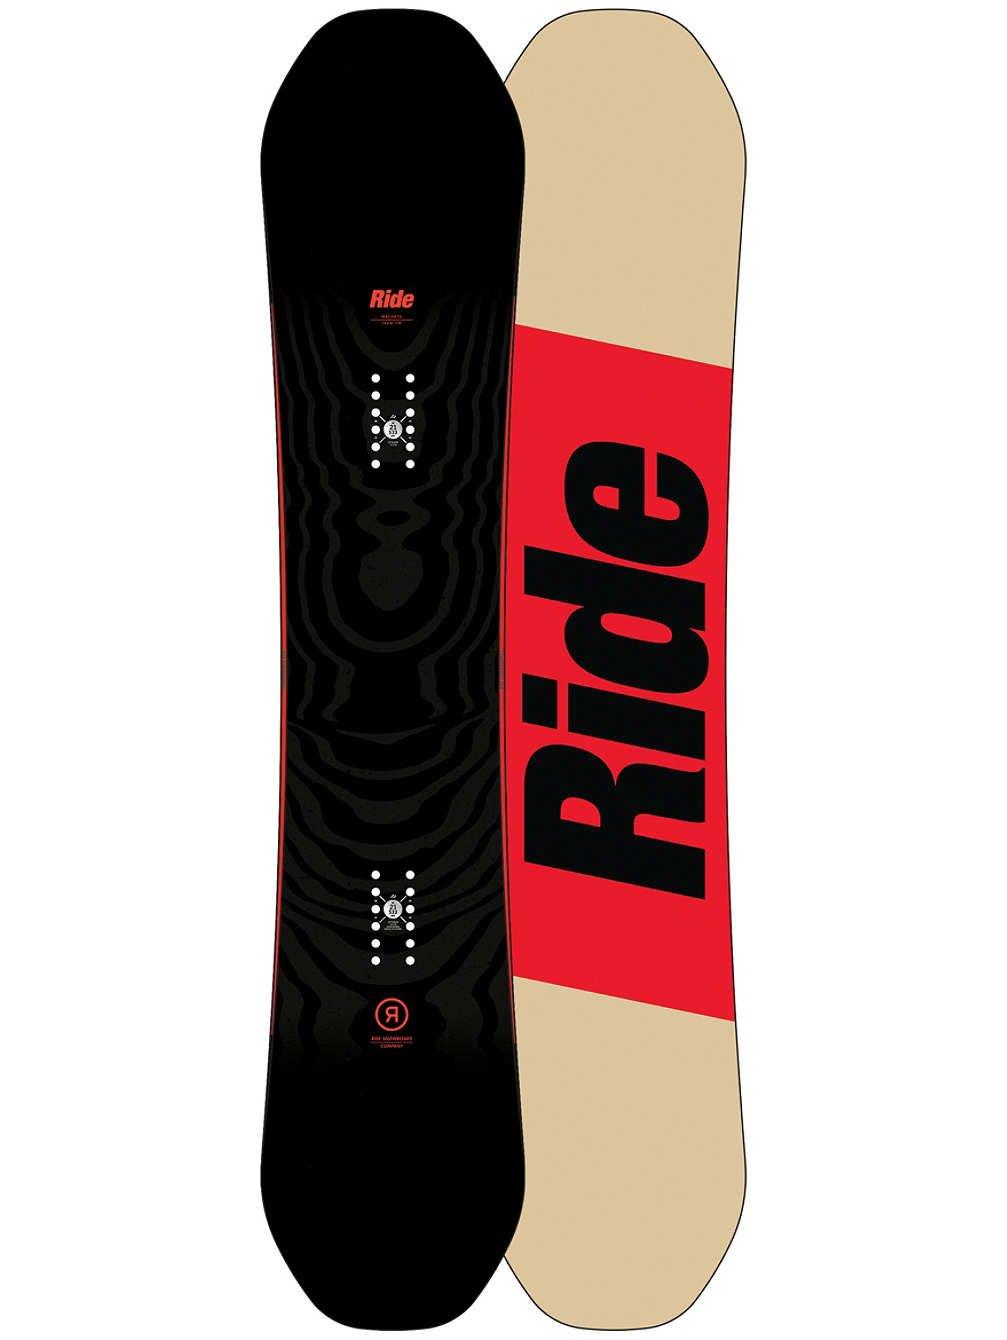 Ride Machete Wideスノーボードメンズ  154cm (W)